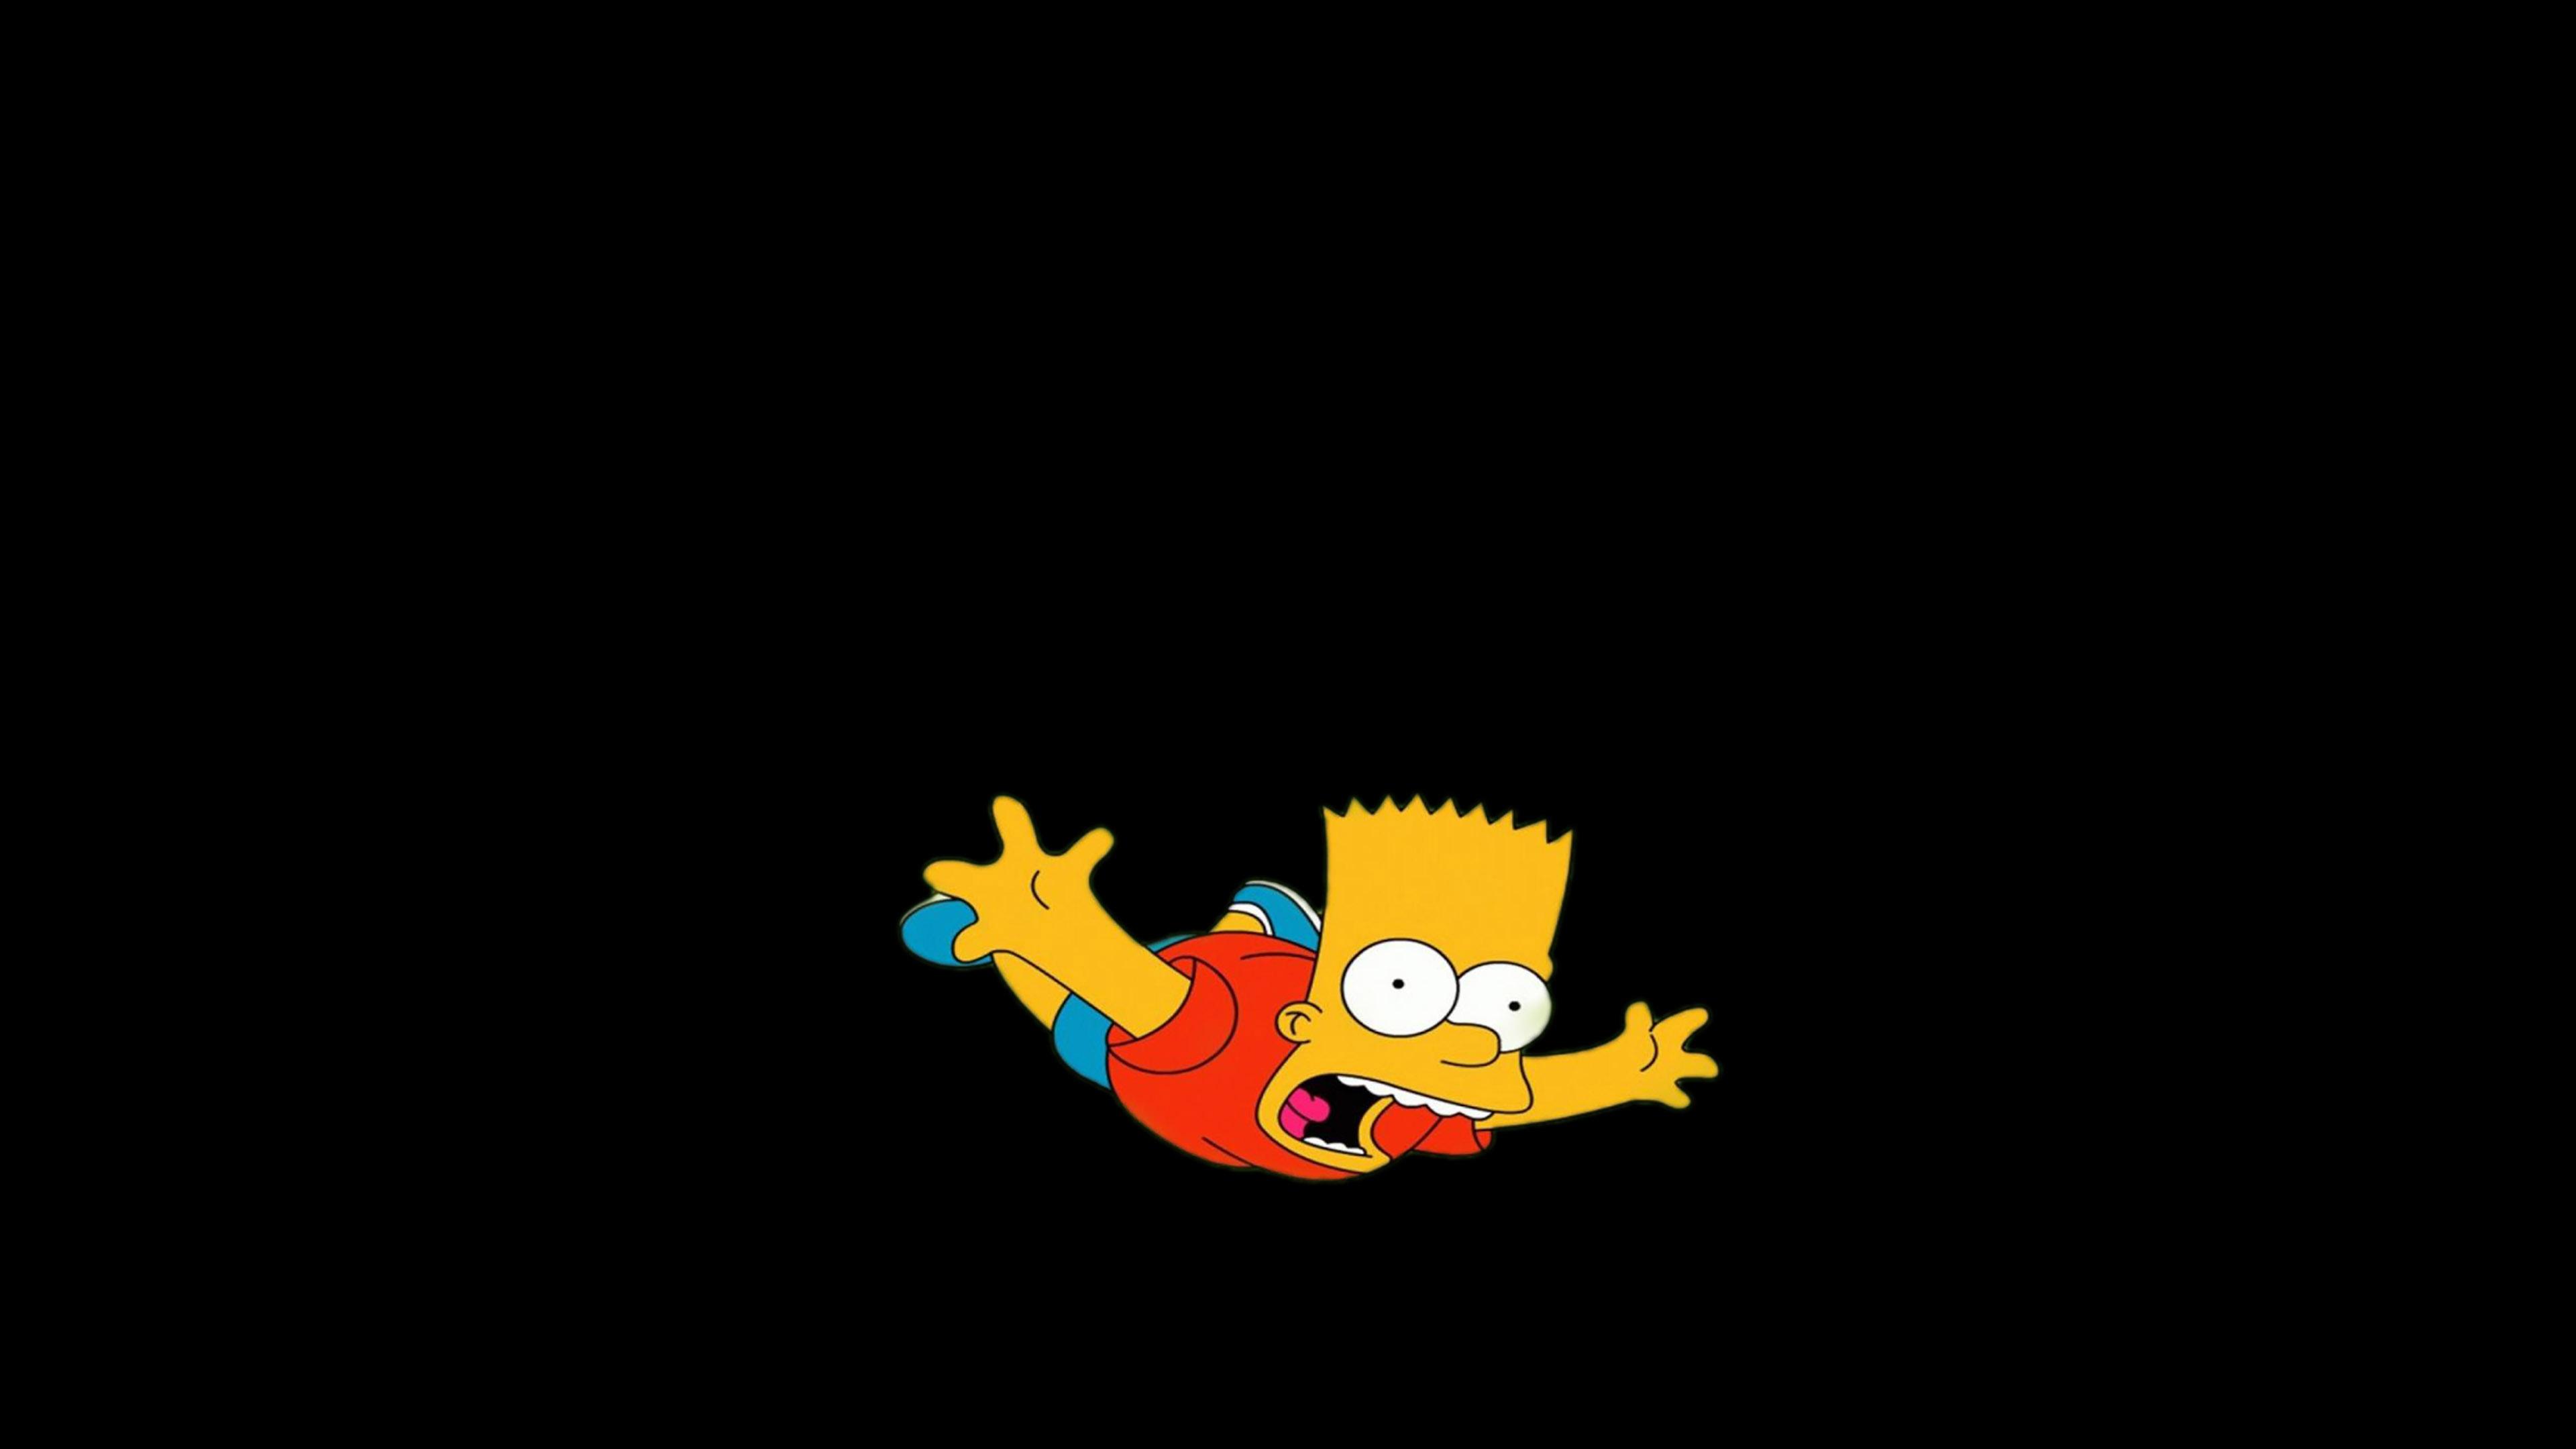 Ag70 Bart Simpson Funny Cute Illlust